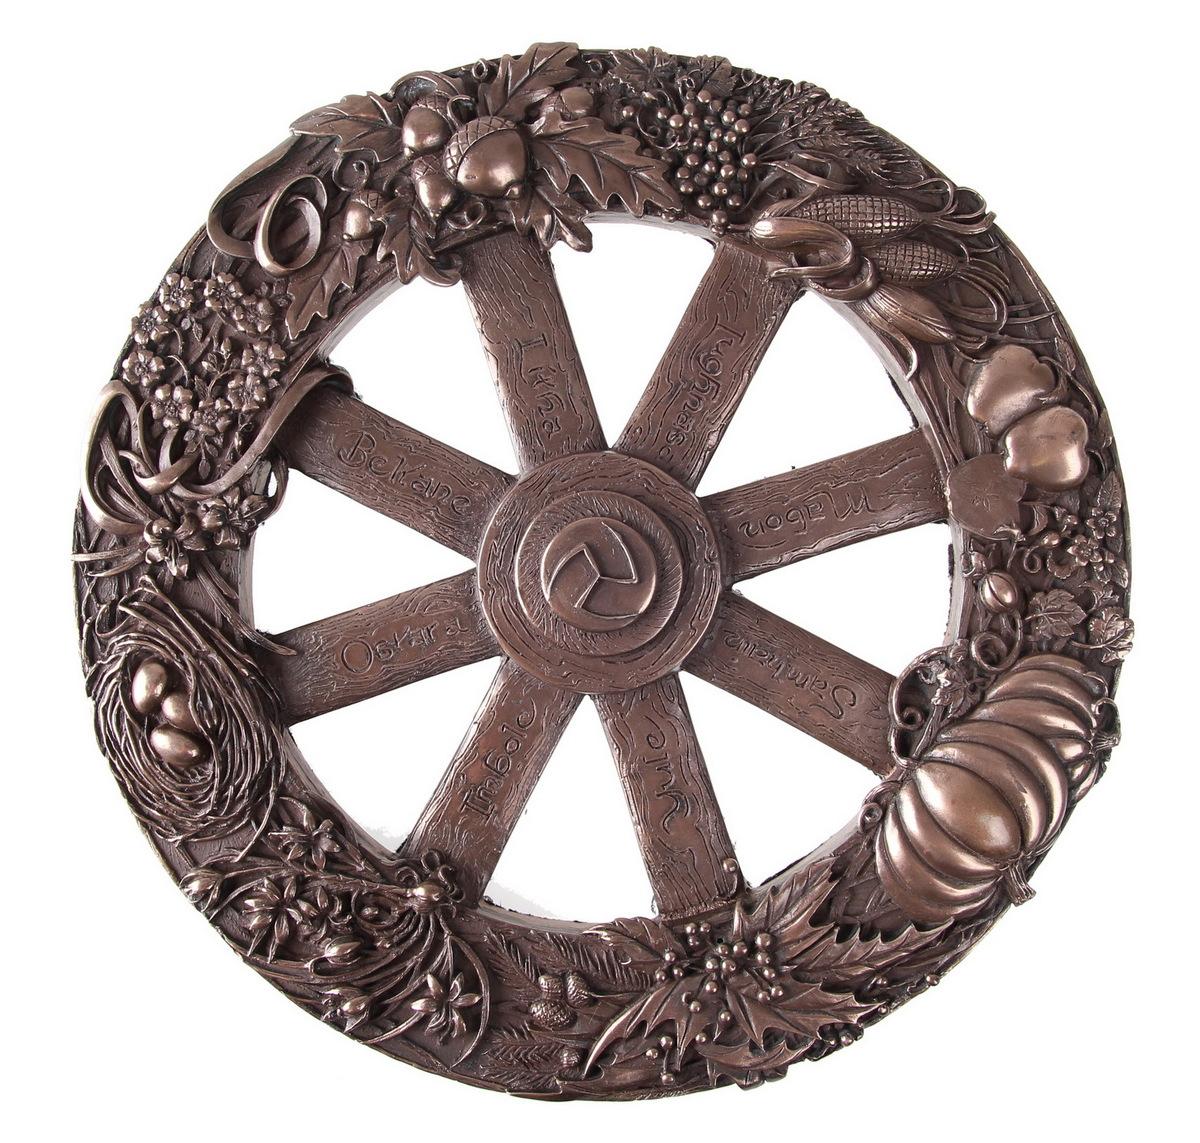 nástěnná dekorace Wheel Of The Year - NENOW - D1469D5